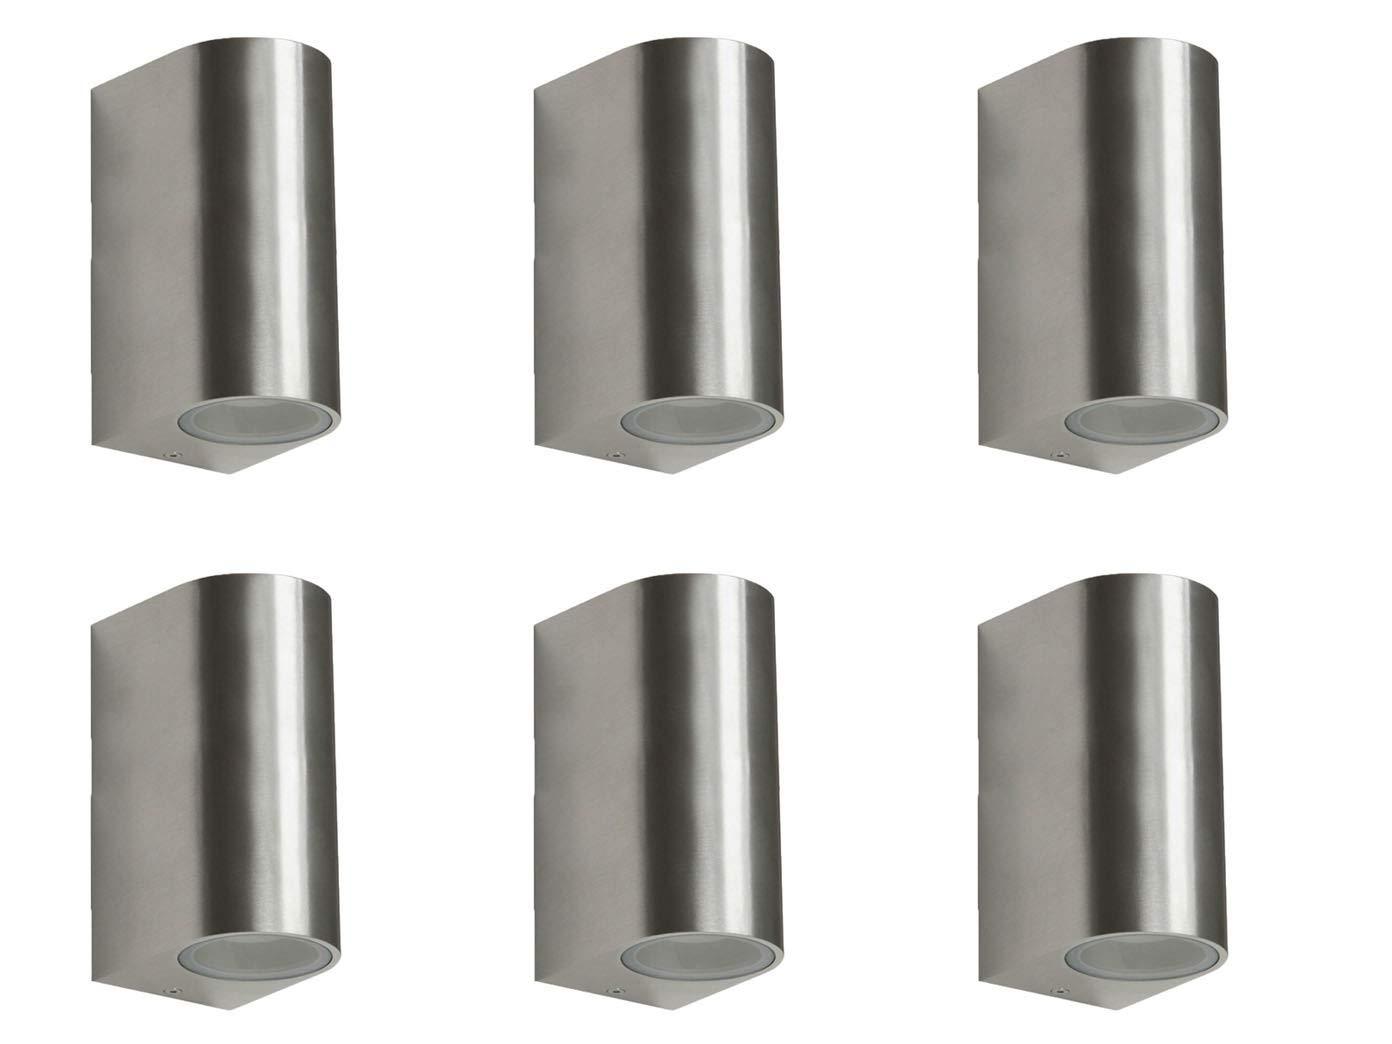 6er Set Ranex SMD-LED Wandleuchte Metall, up downlight, 160Lm, warm, warm, warm, IP44, 5000.467-6 6e3cc9